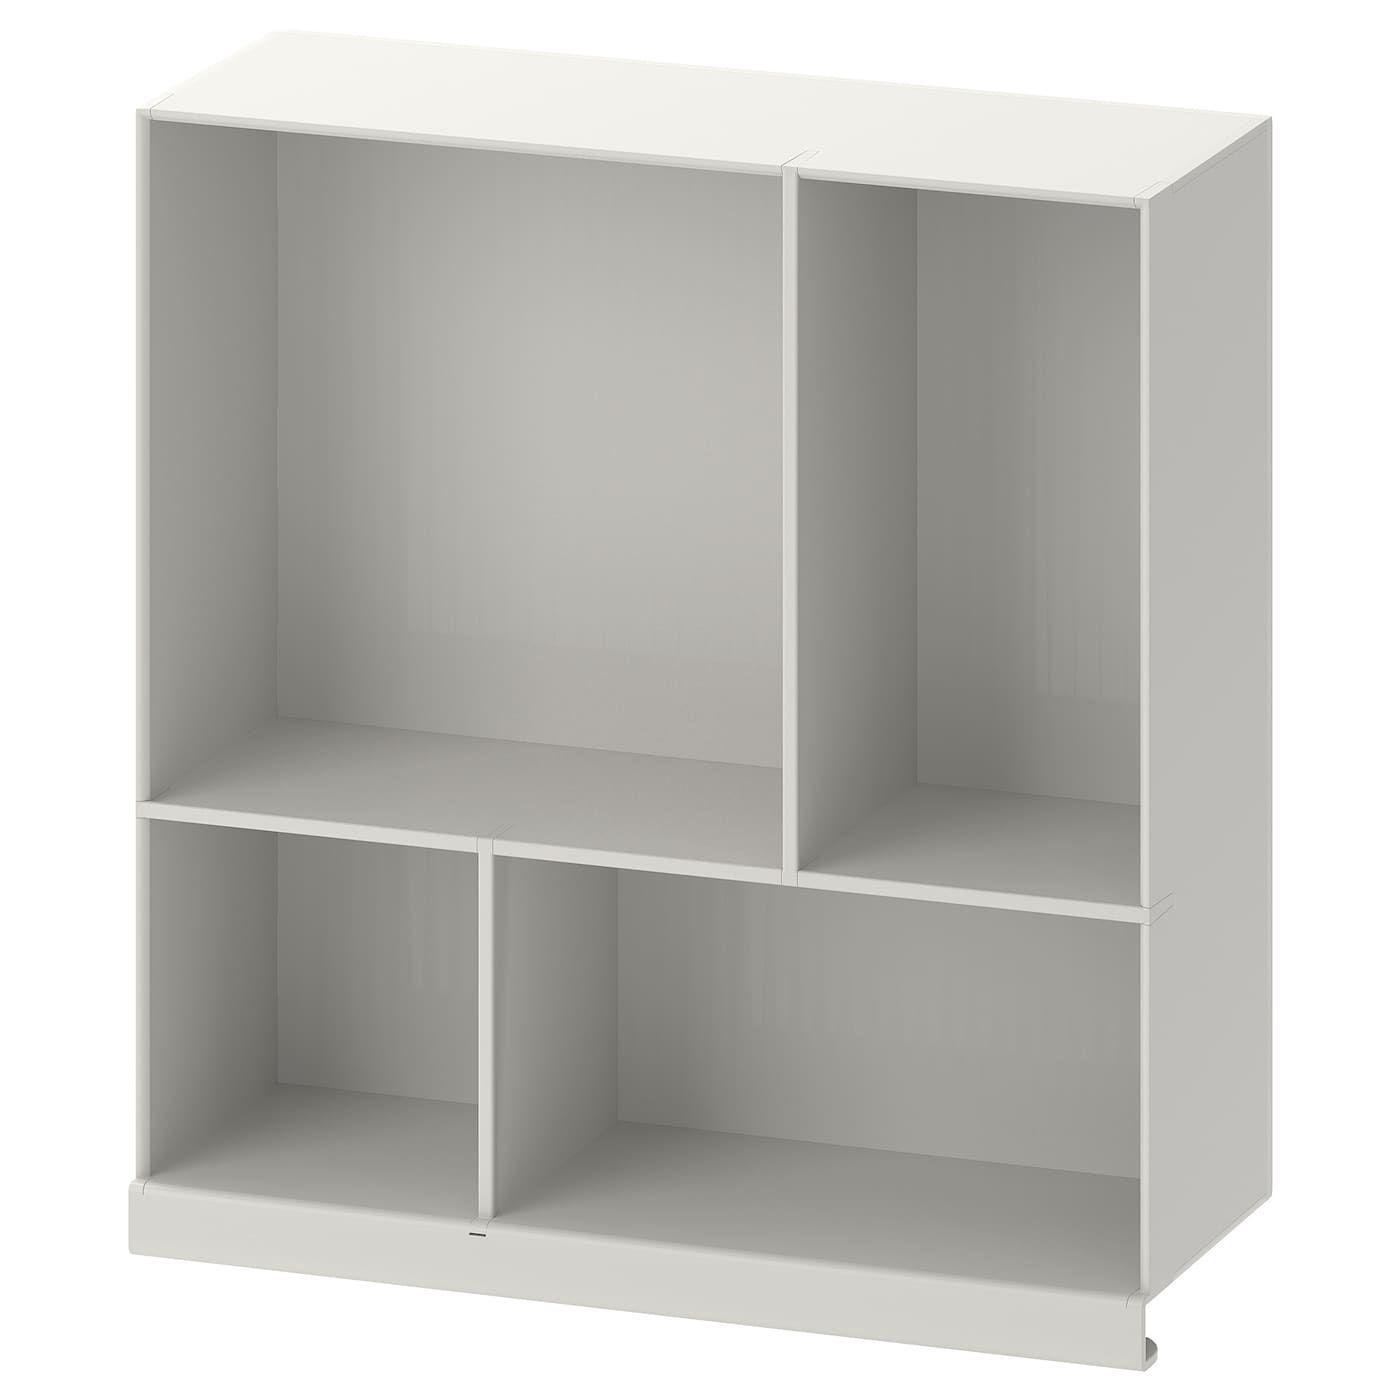 Kallax Shelf Insert Light Gray Ikea Kallax Shelf Kallax Shelf